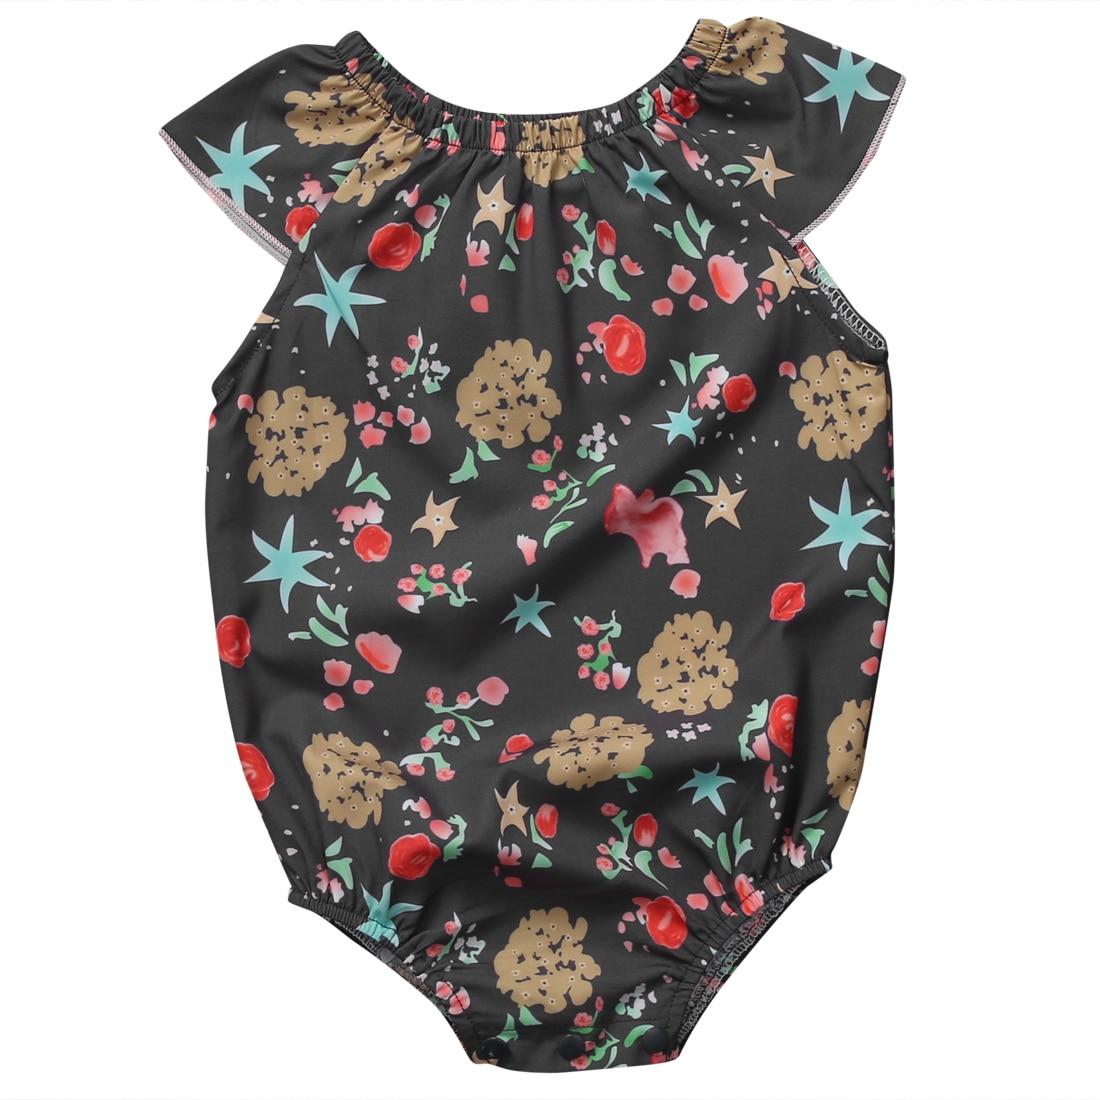 Newborn Baby Girl Floral Romper Jumpsuit Sunsuit One-Pieces Outfits Summer Infant Clothes 0-24M